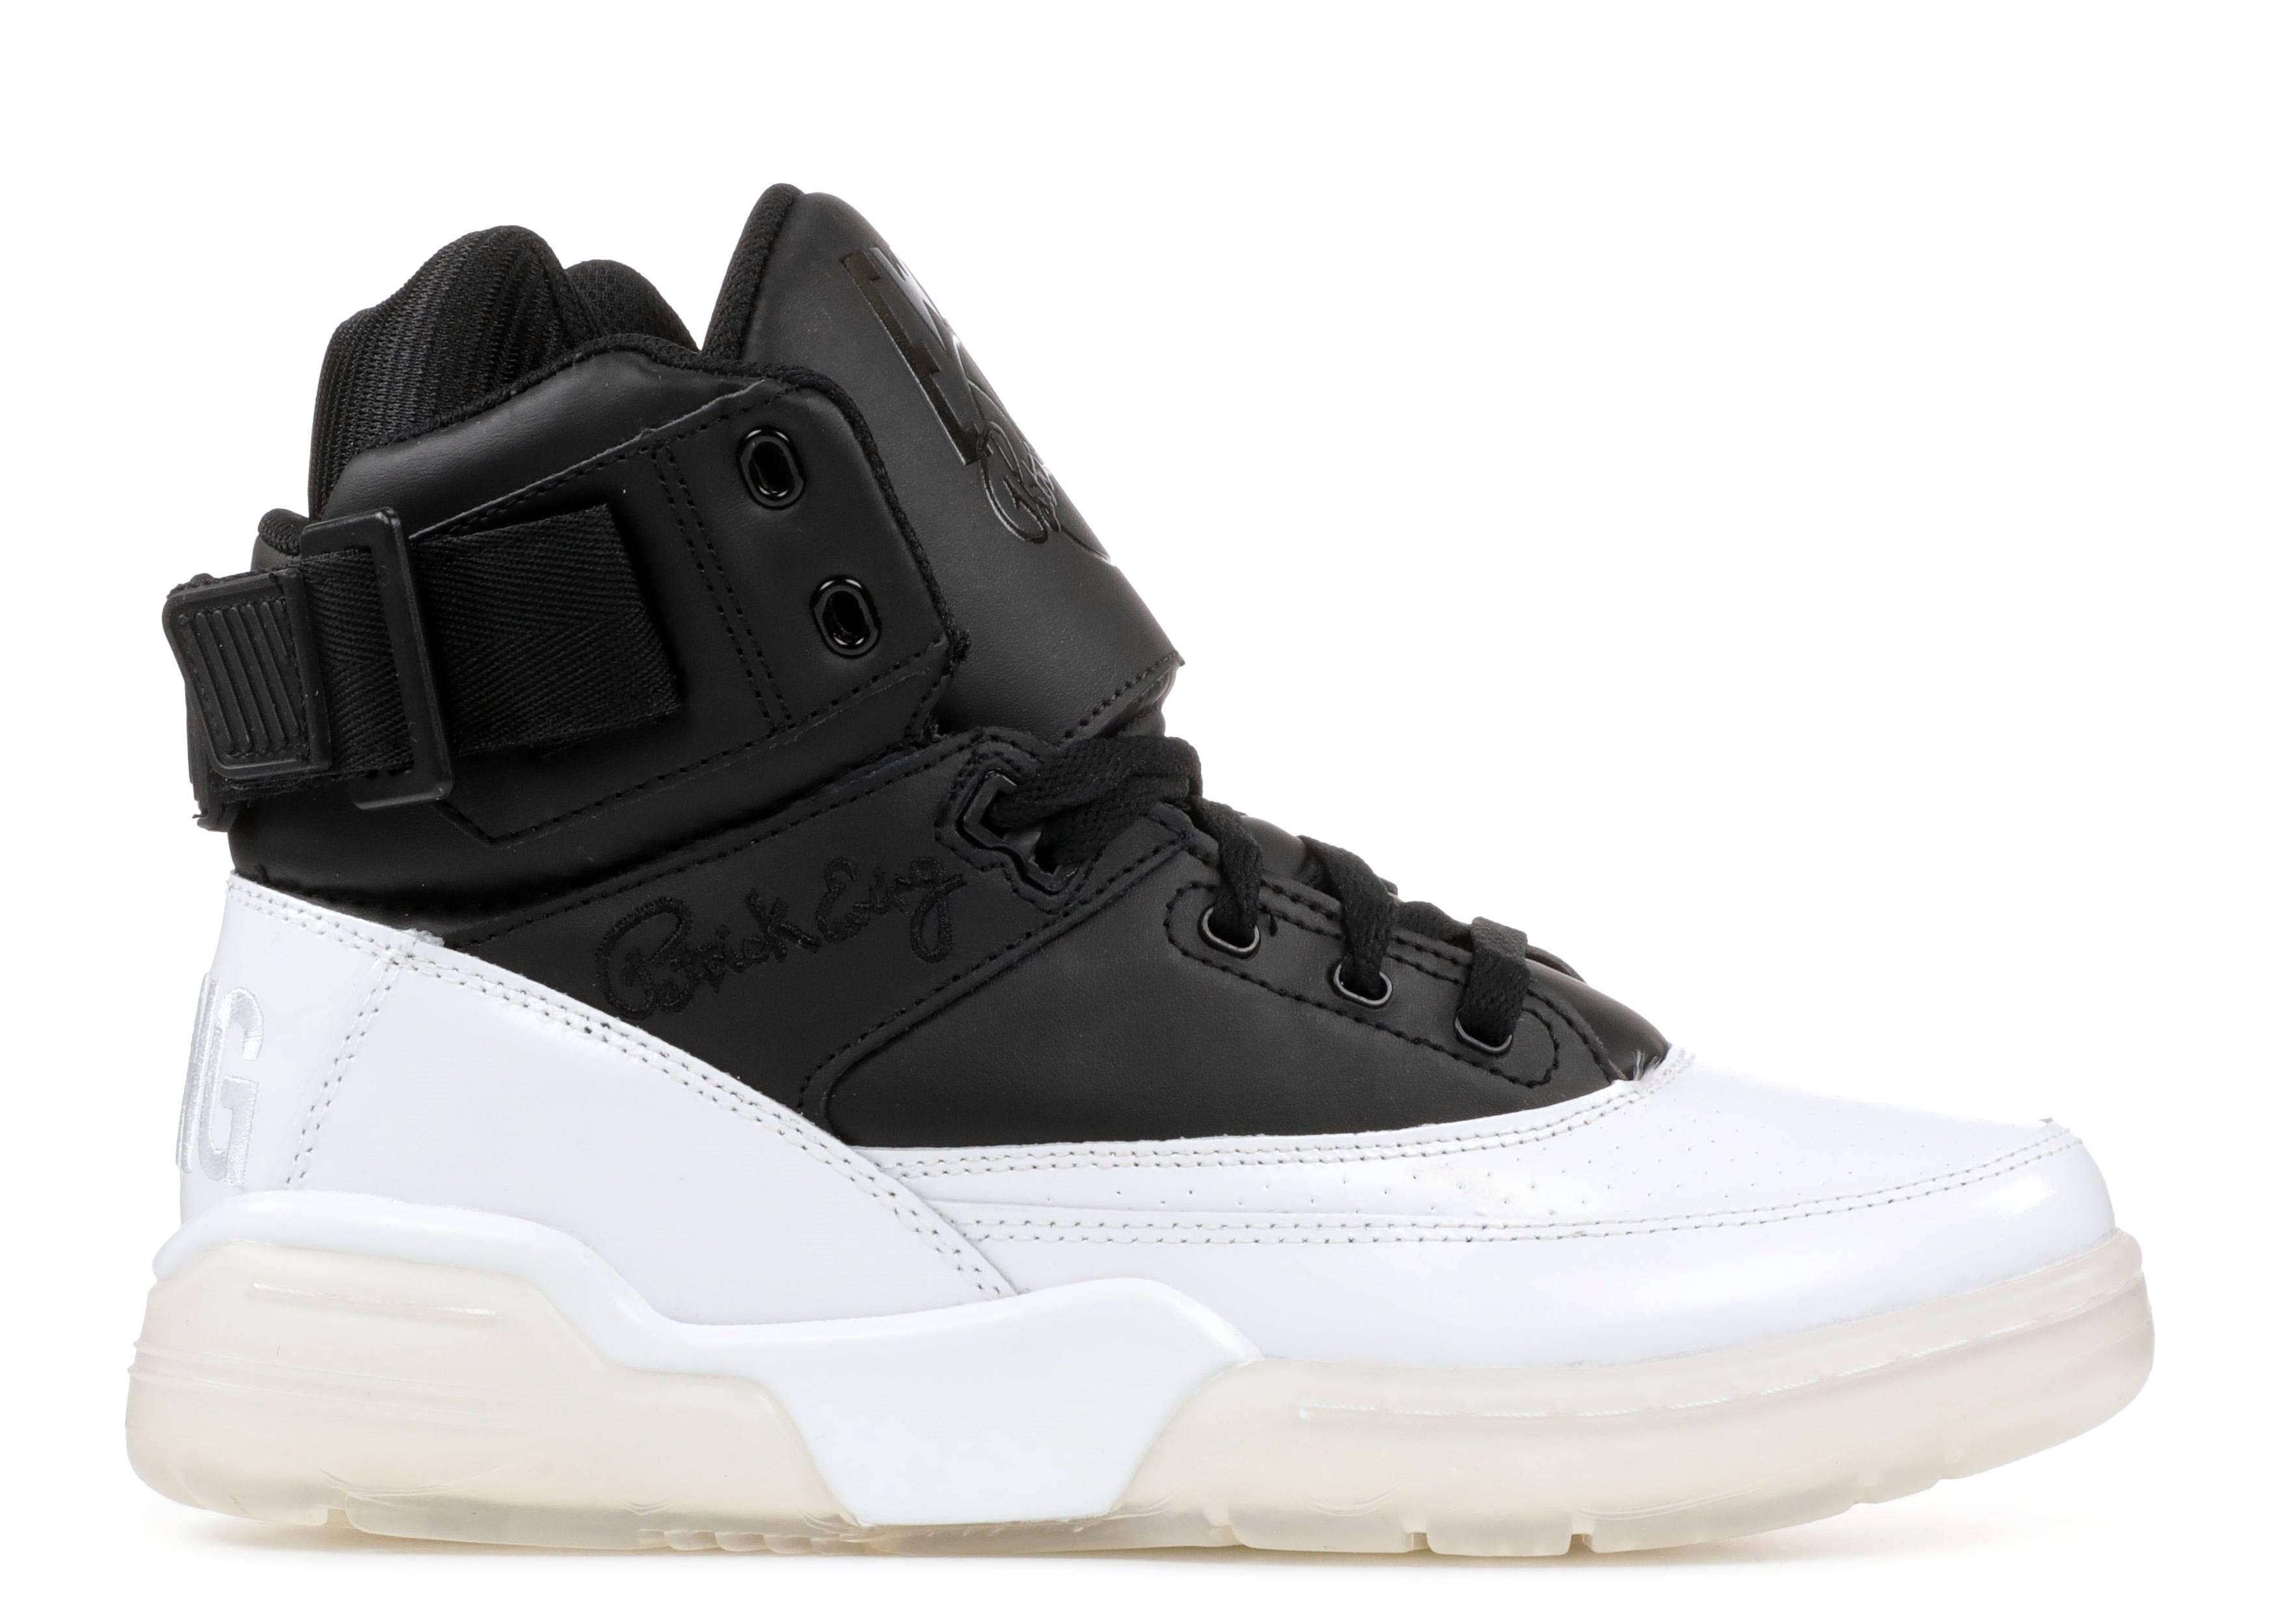 ce6834466856ab Patrick Ewing Shoes - Men s 33 Hi   More High Tops